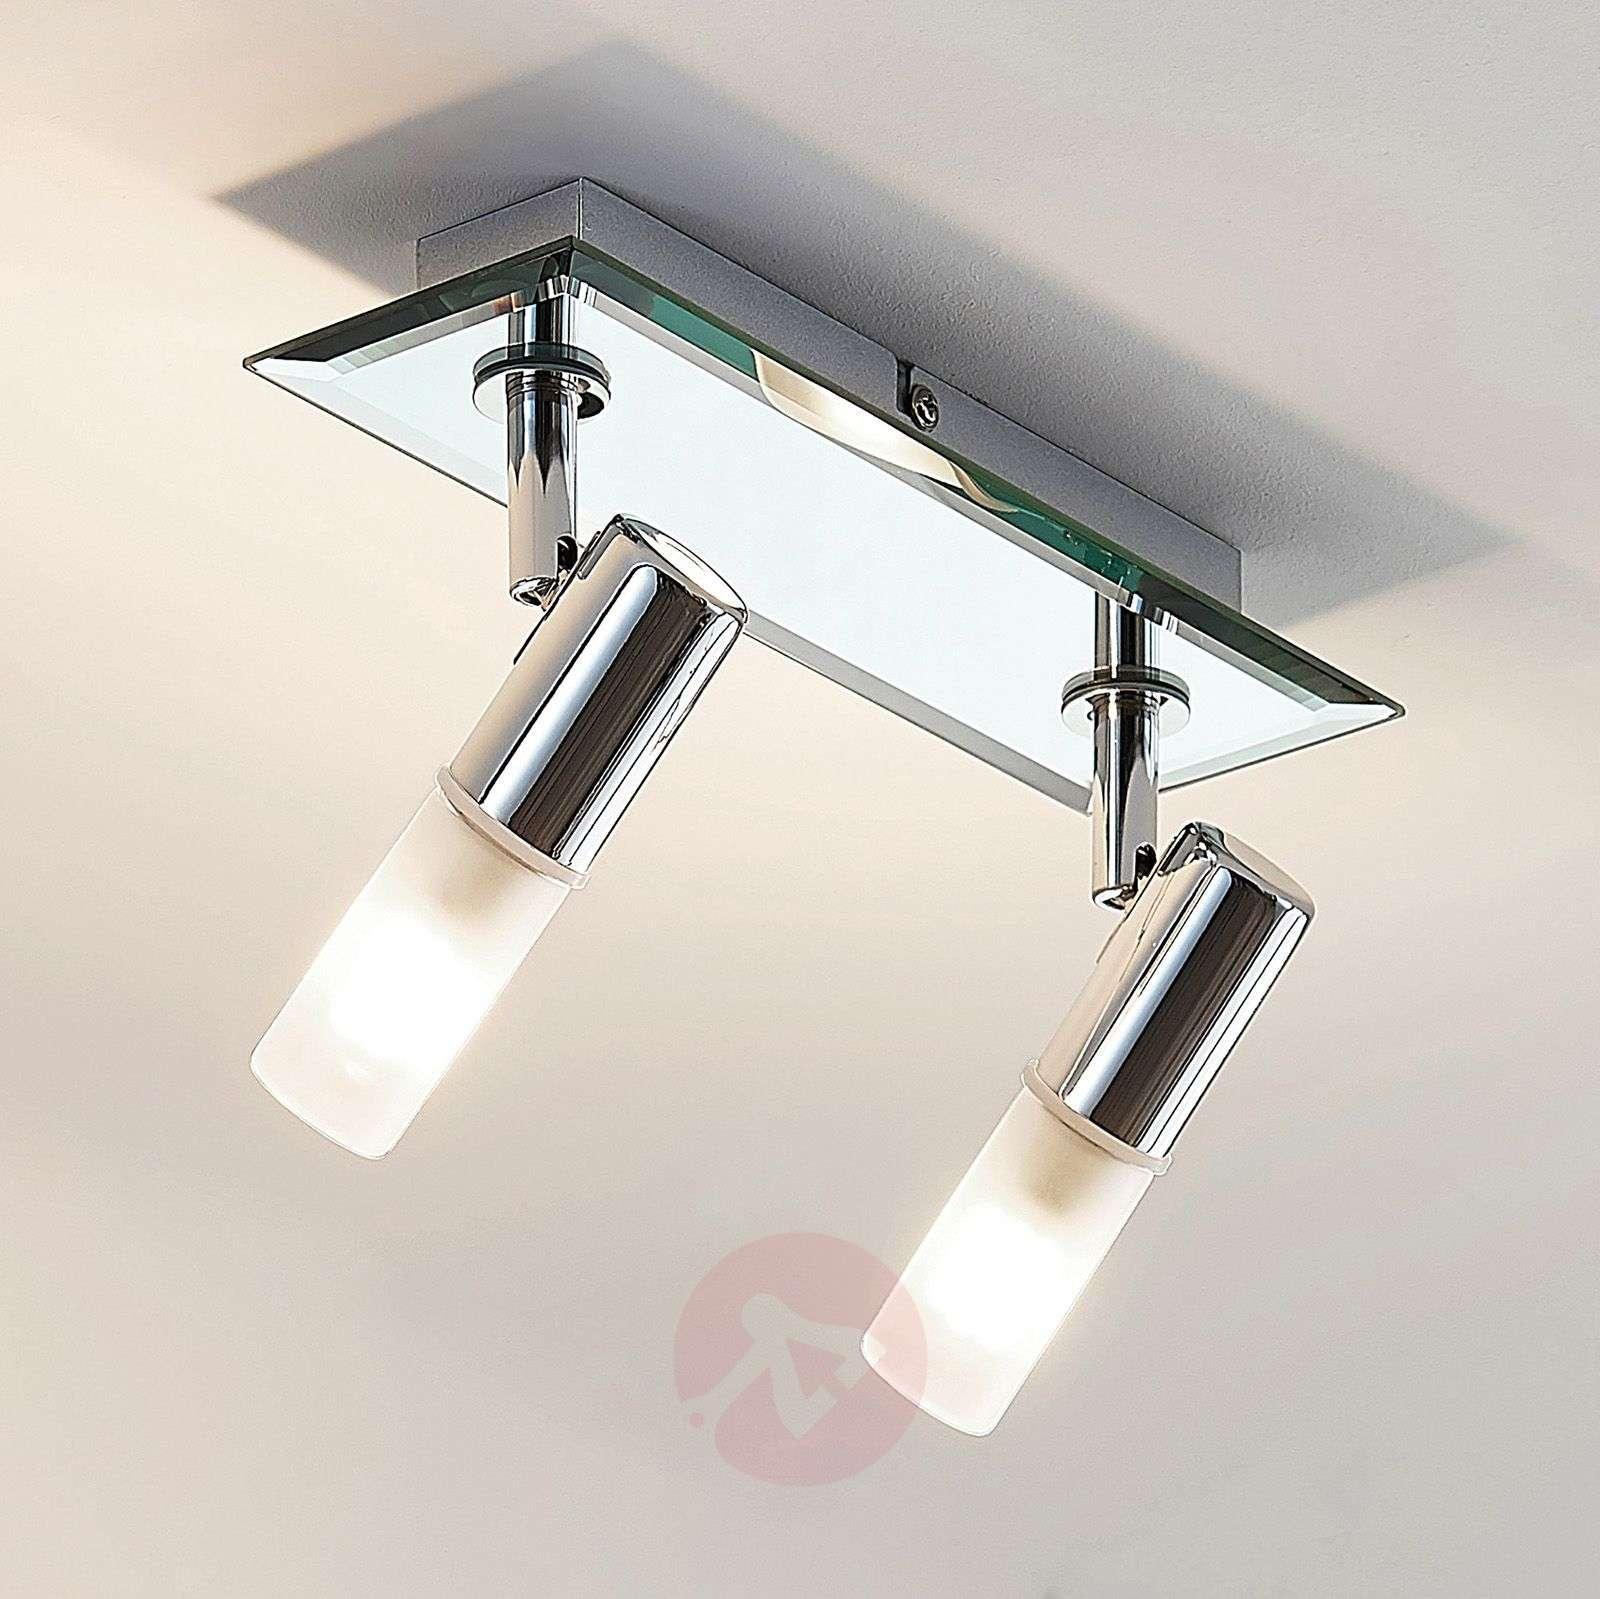 Kylpyhuoneen kattolamppu Zela, 2-lamppuinen kromi-9624384-02